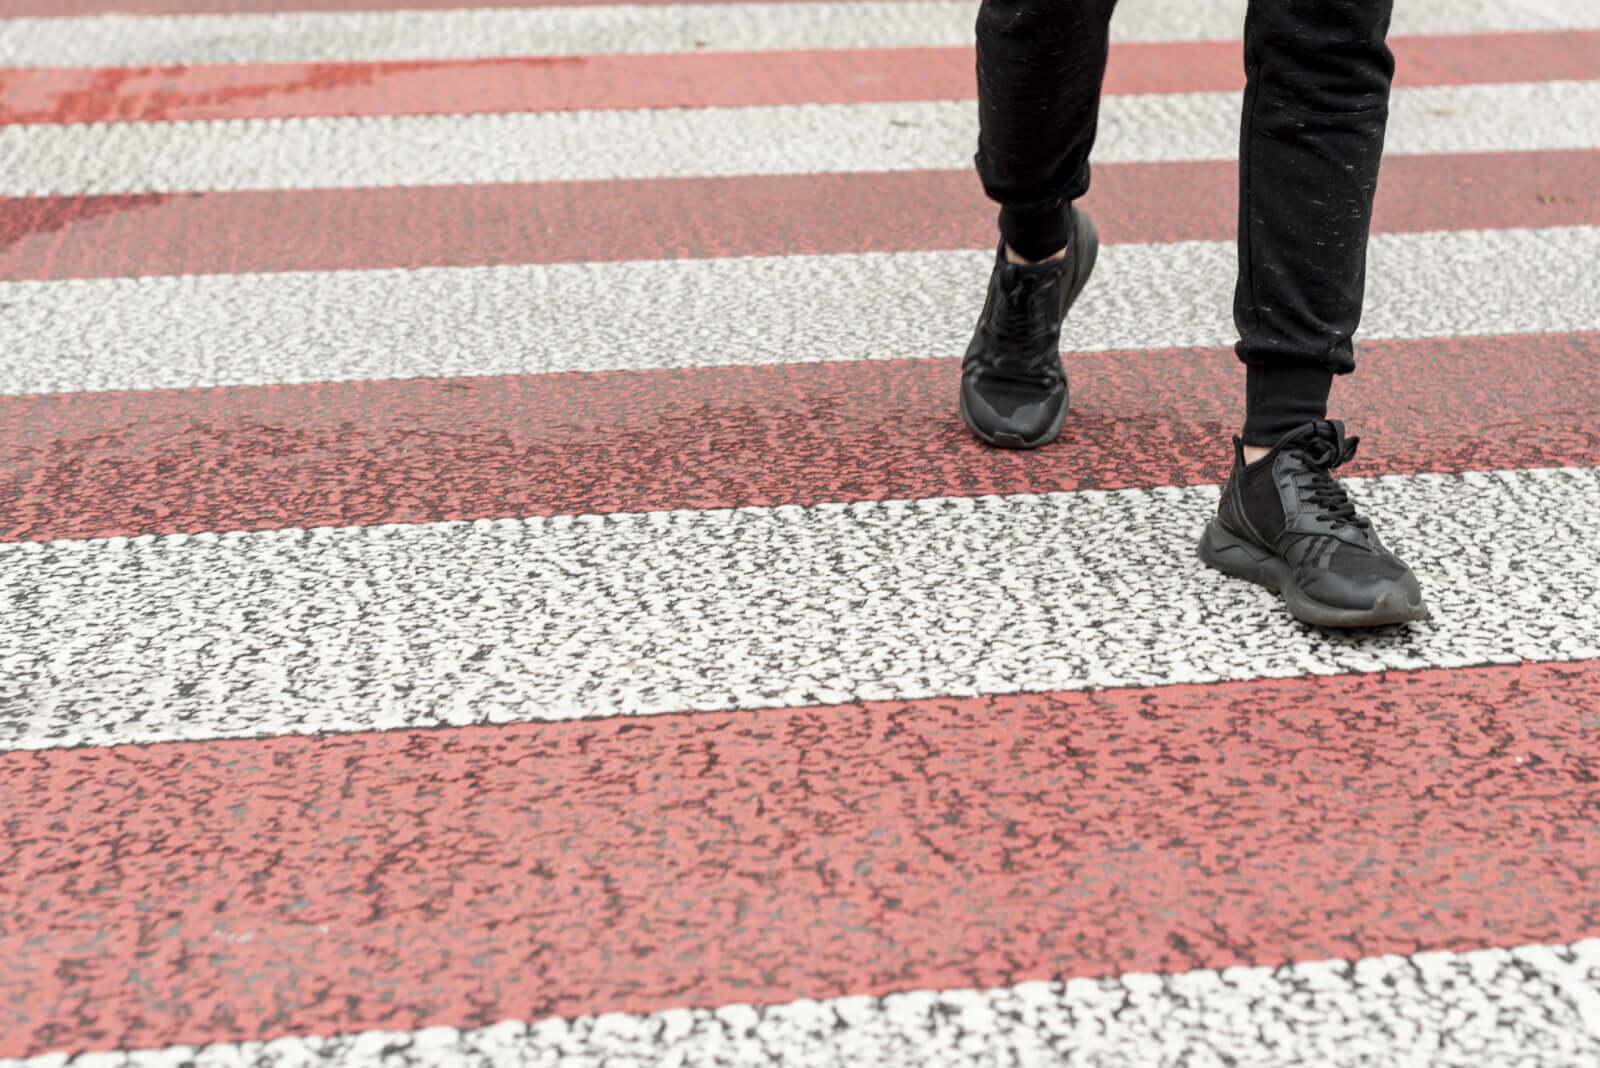 walking vs running shoes photo image